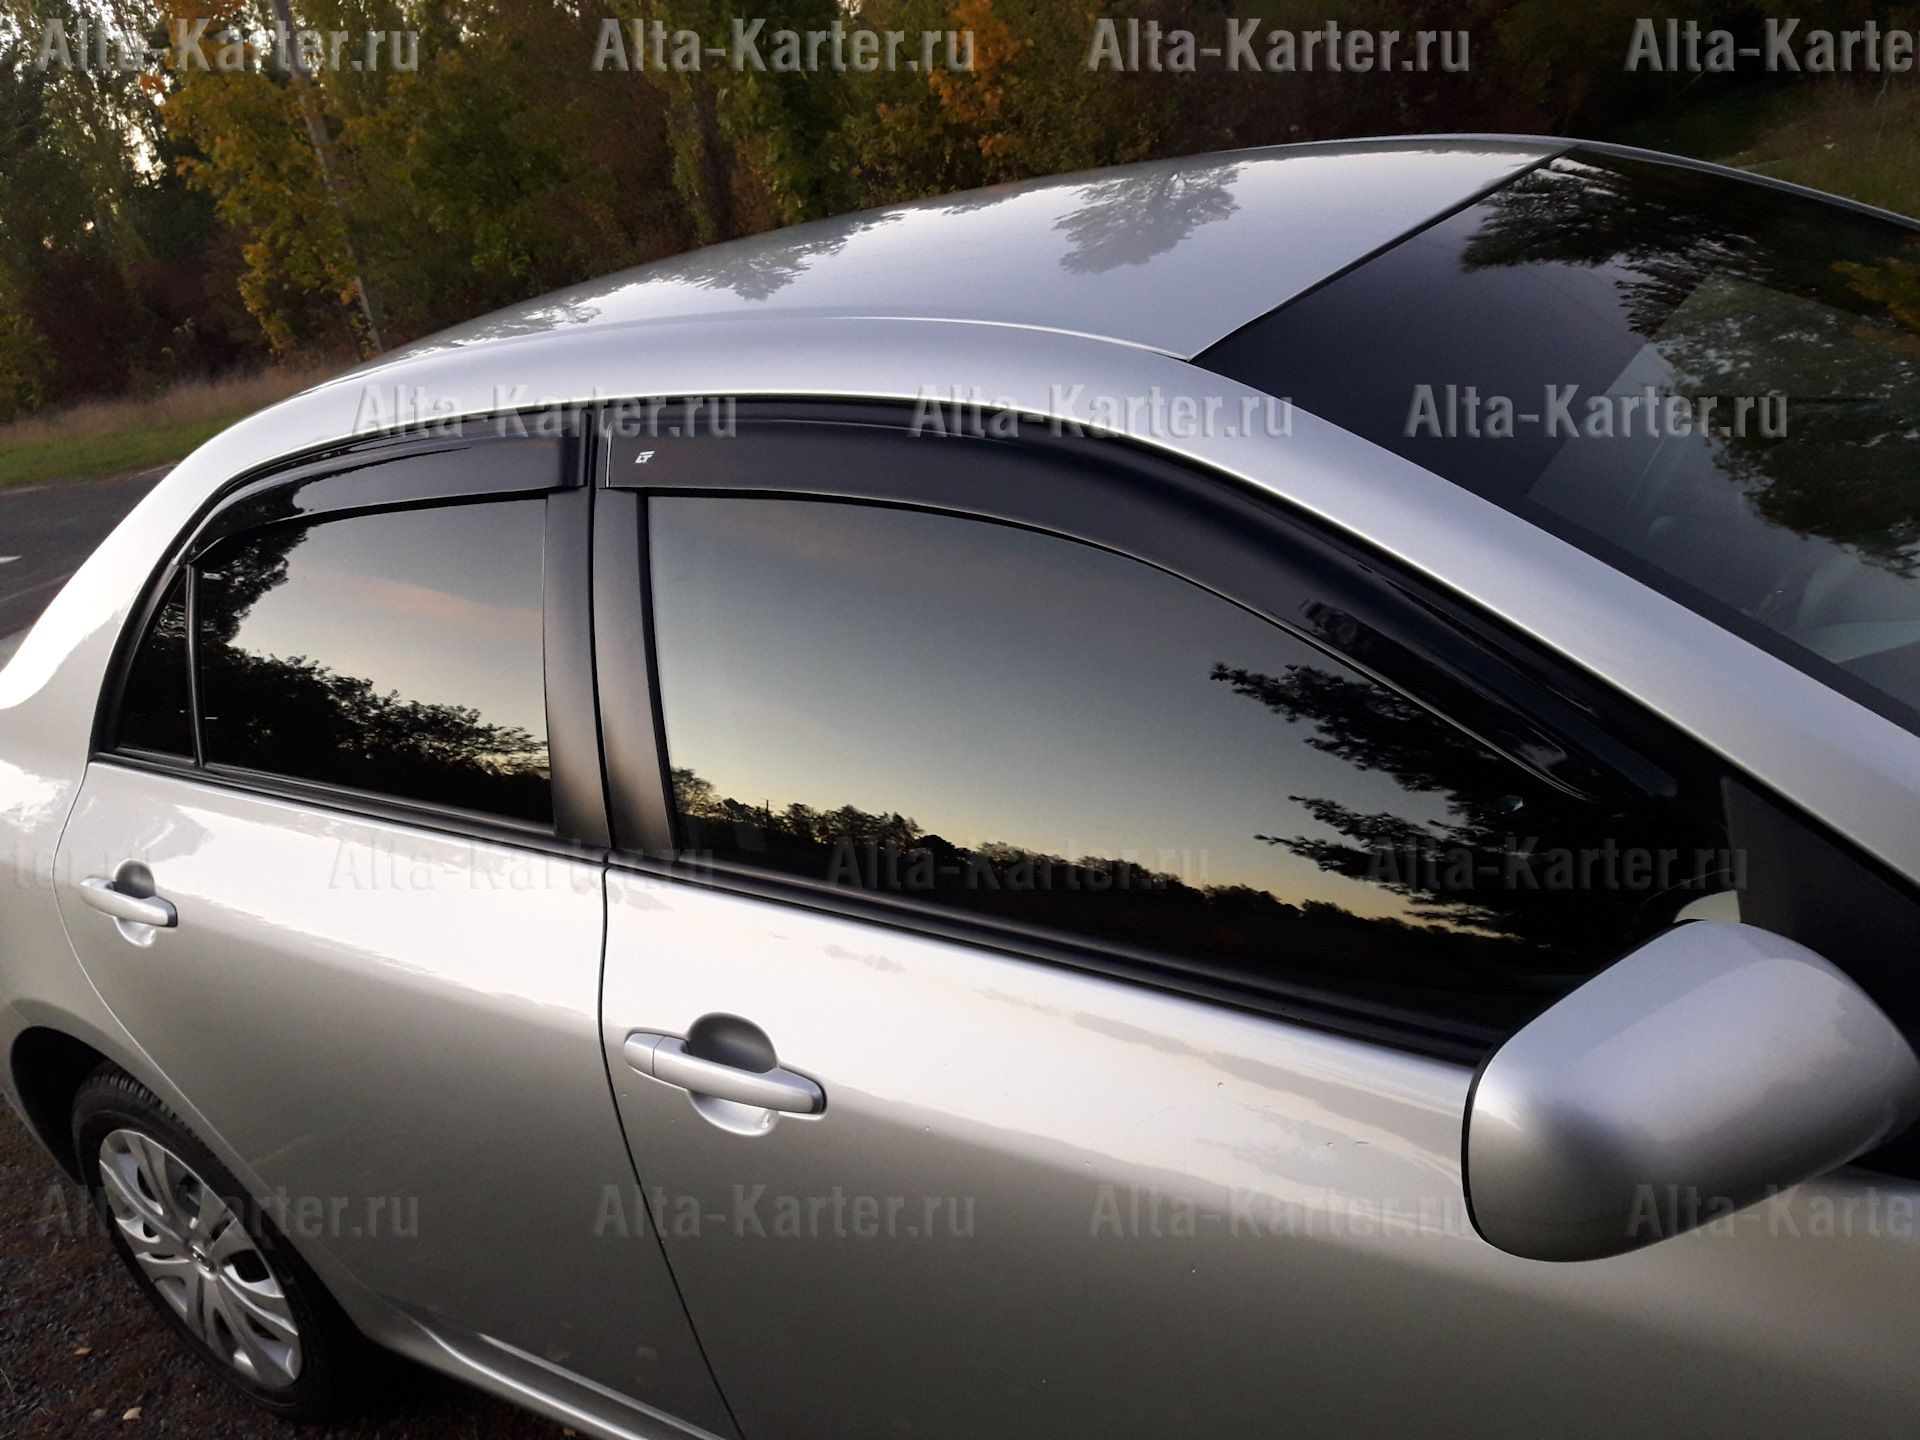 Дефлекторы Cobra Tuning EuroStandart для окон Opel Astra G универсал 1998-2004. Артикул OE11698